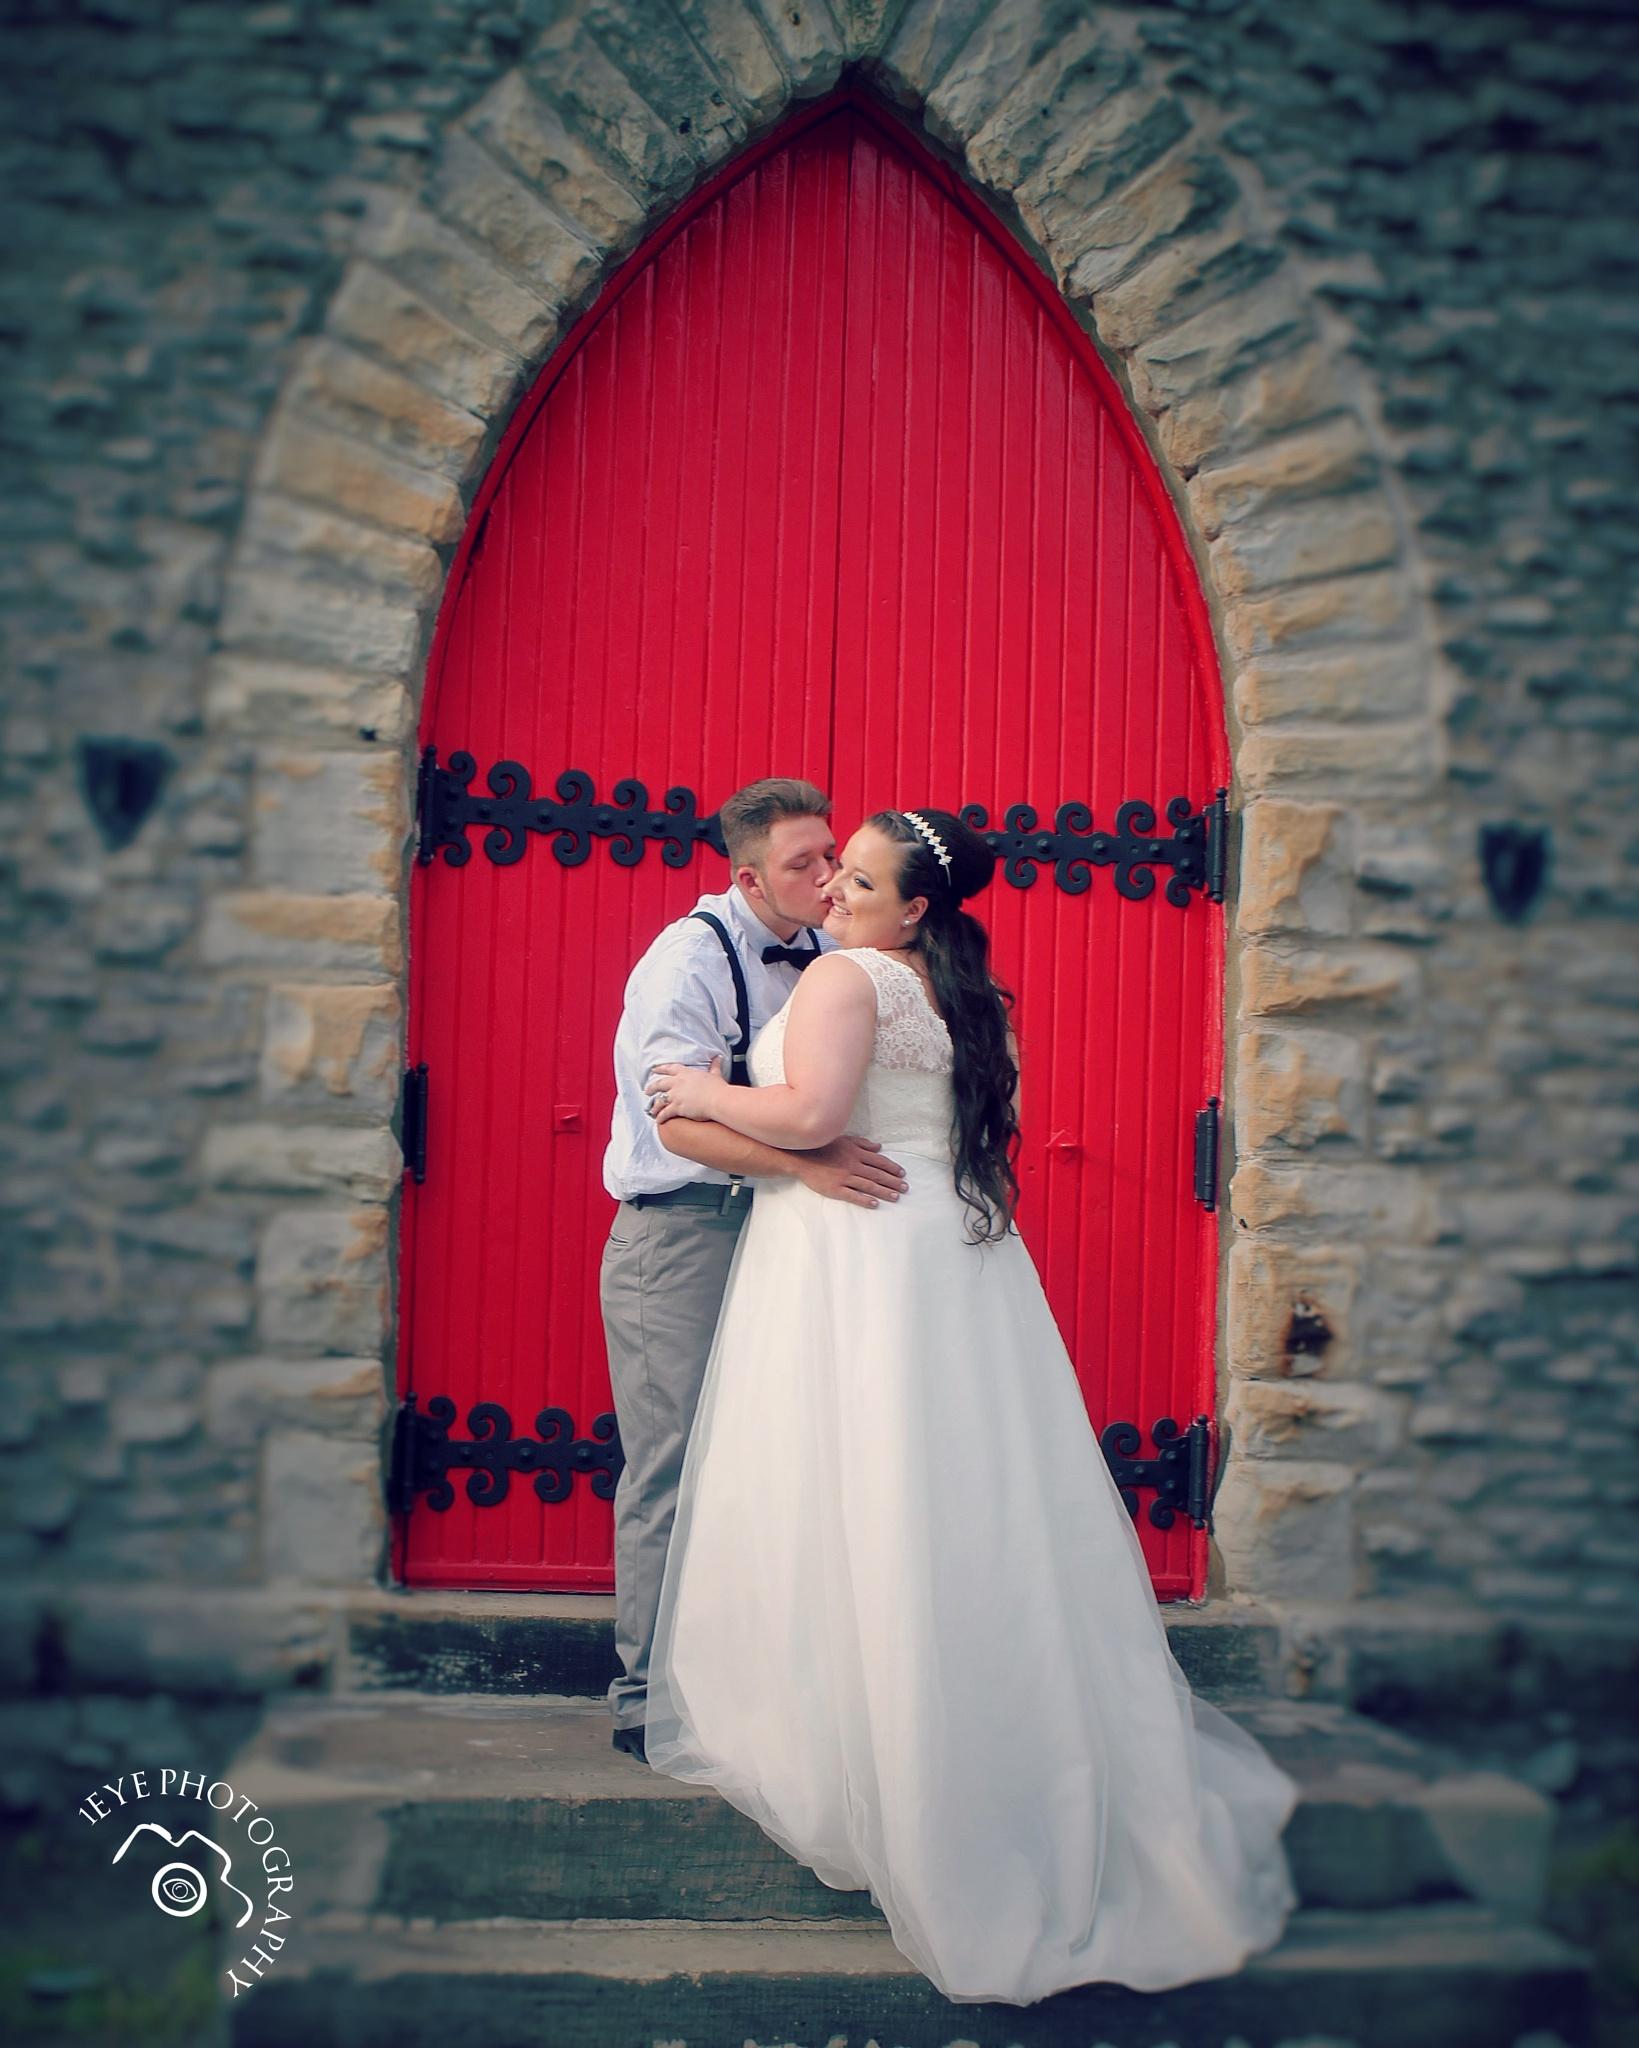 Thompson Wedding by Tricia Simpkins